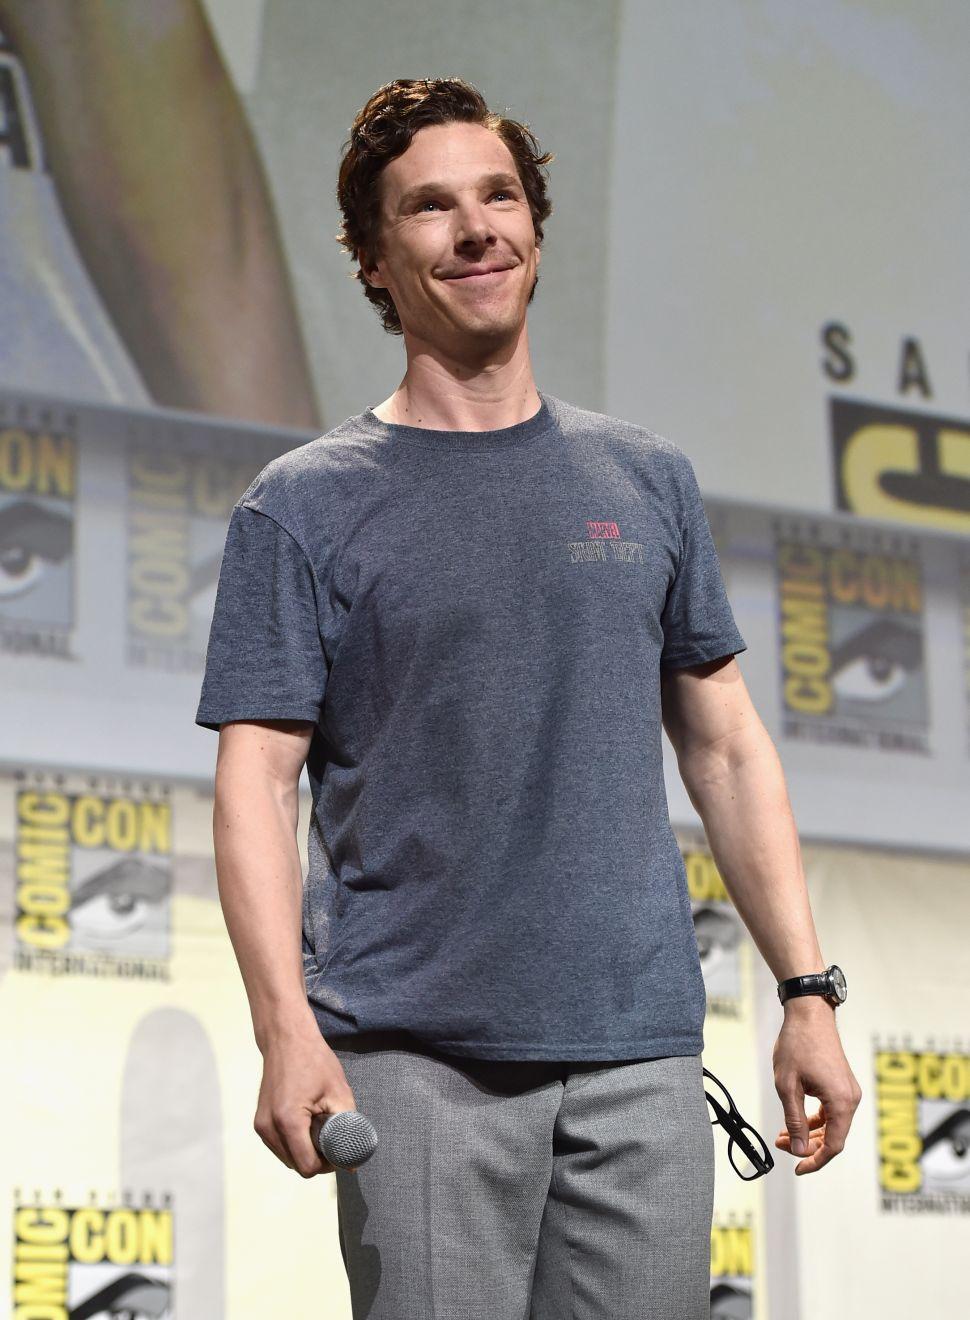 Benedict Cumberbatch Reads Sol LeWitt, Putin Gives the Gift of Art